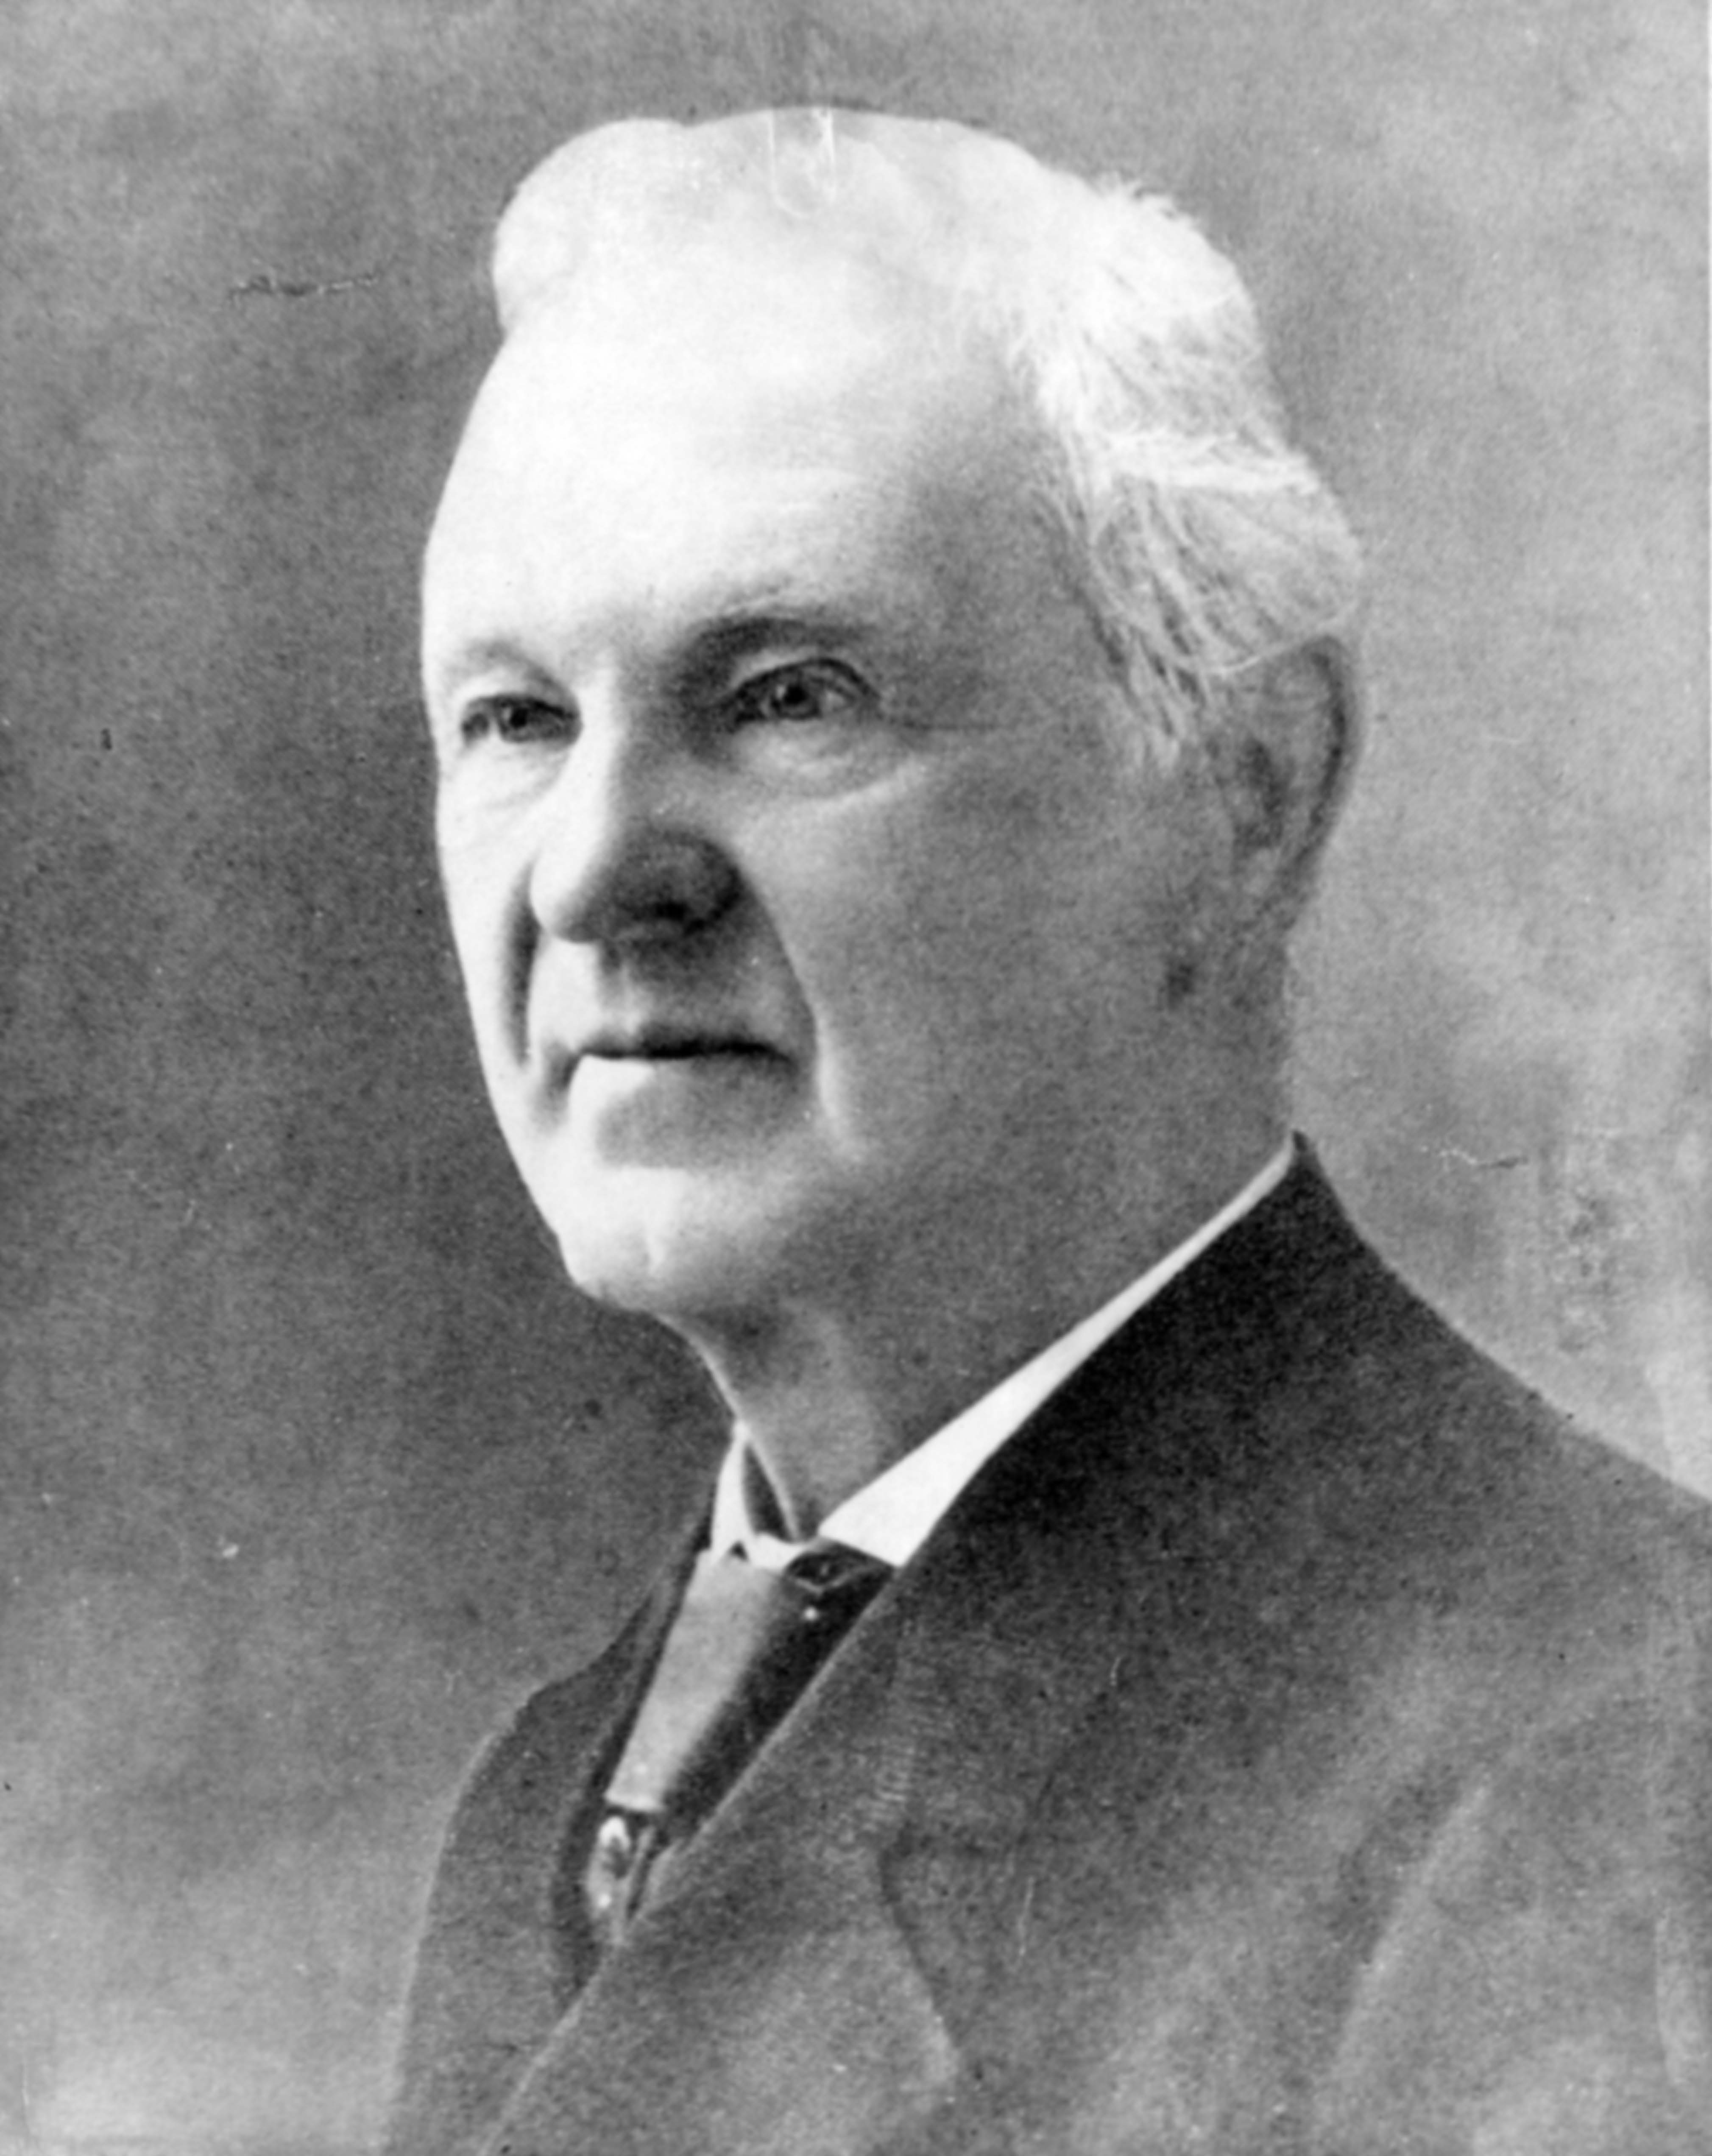 William B. Mitchell